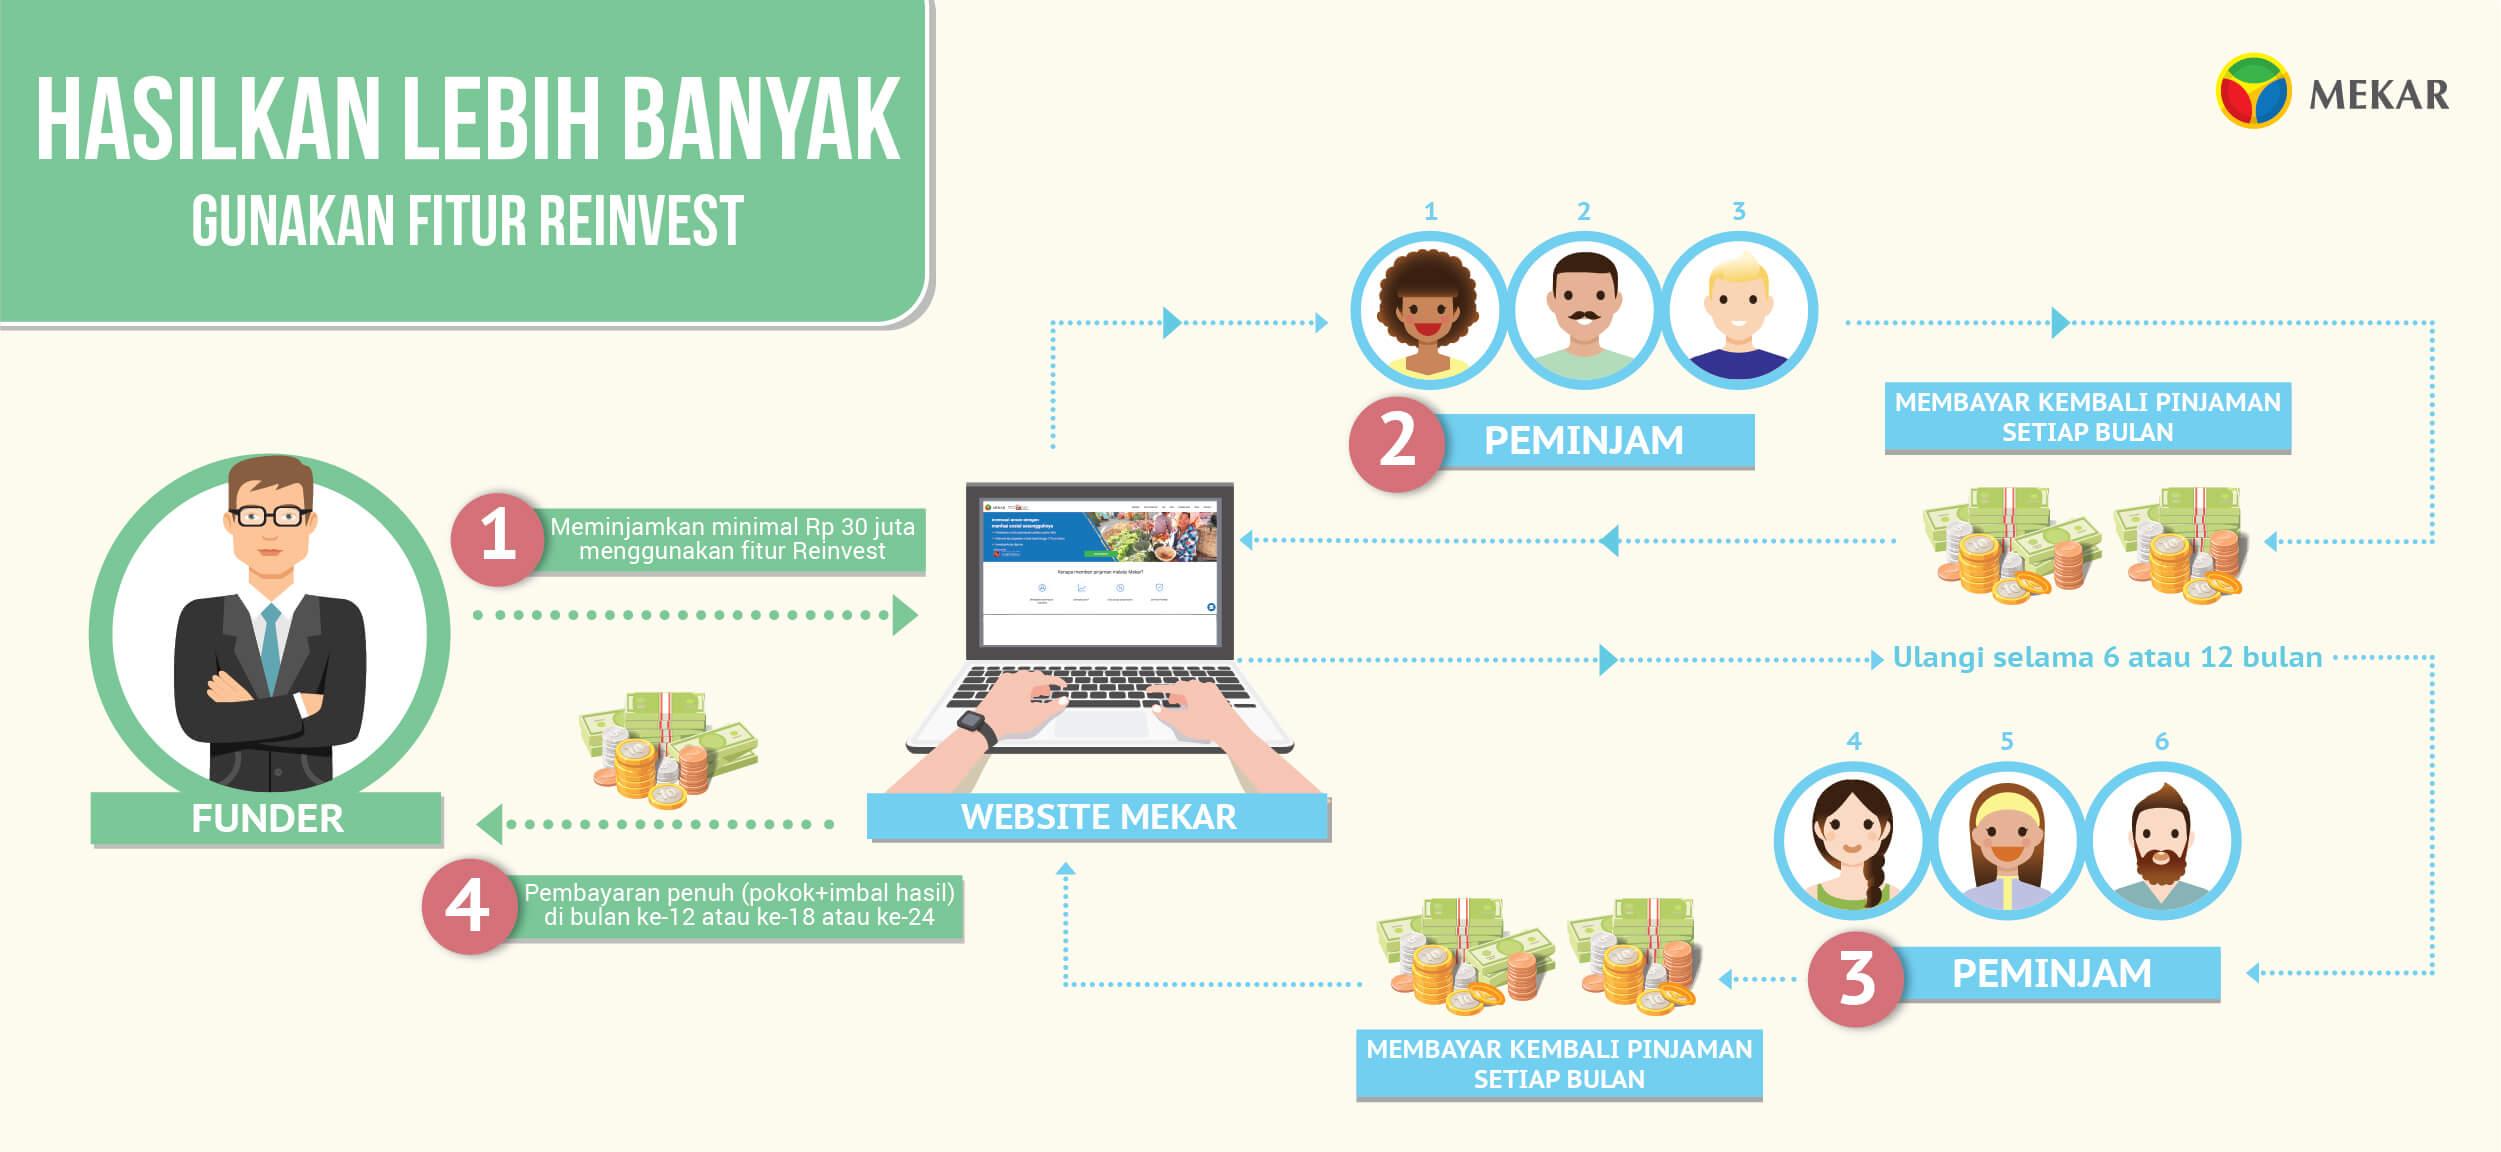 Infografis Skema Fitur Reinvest Mekar